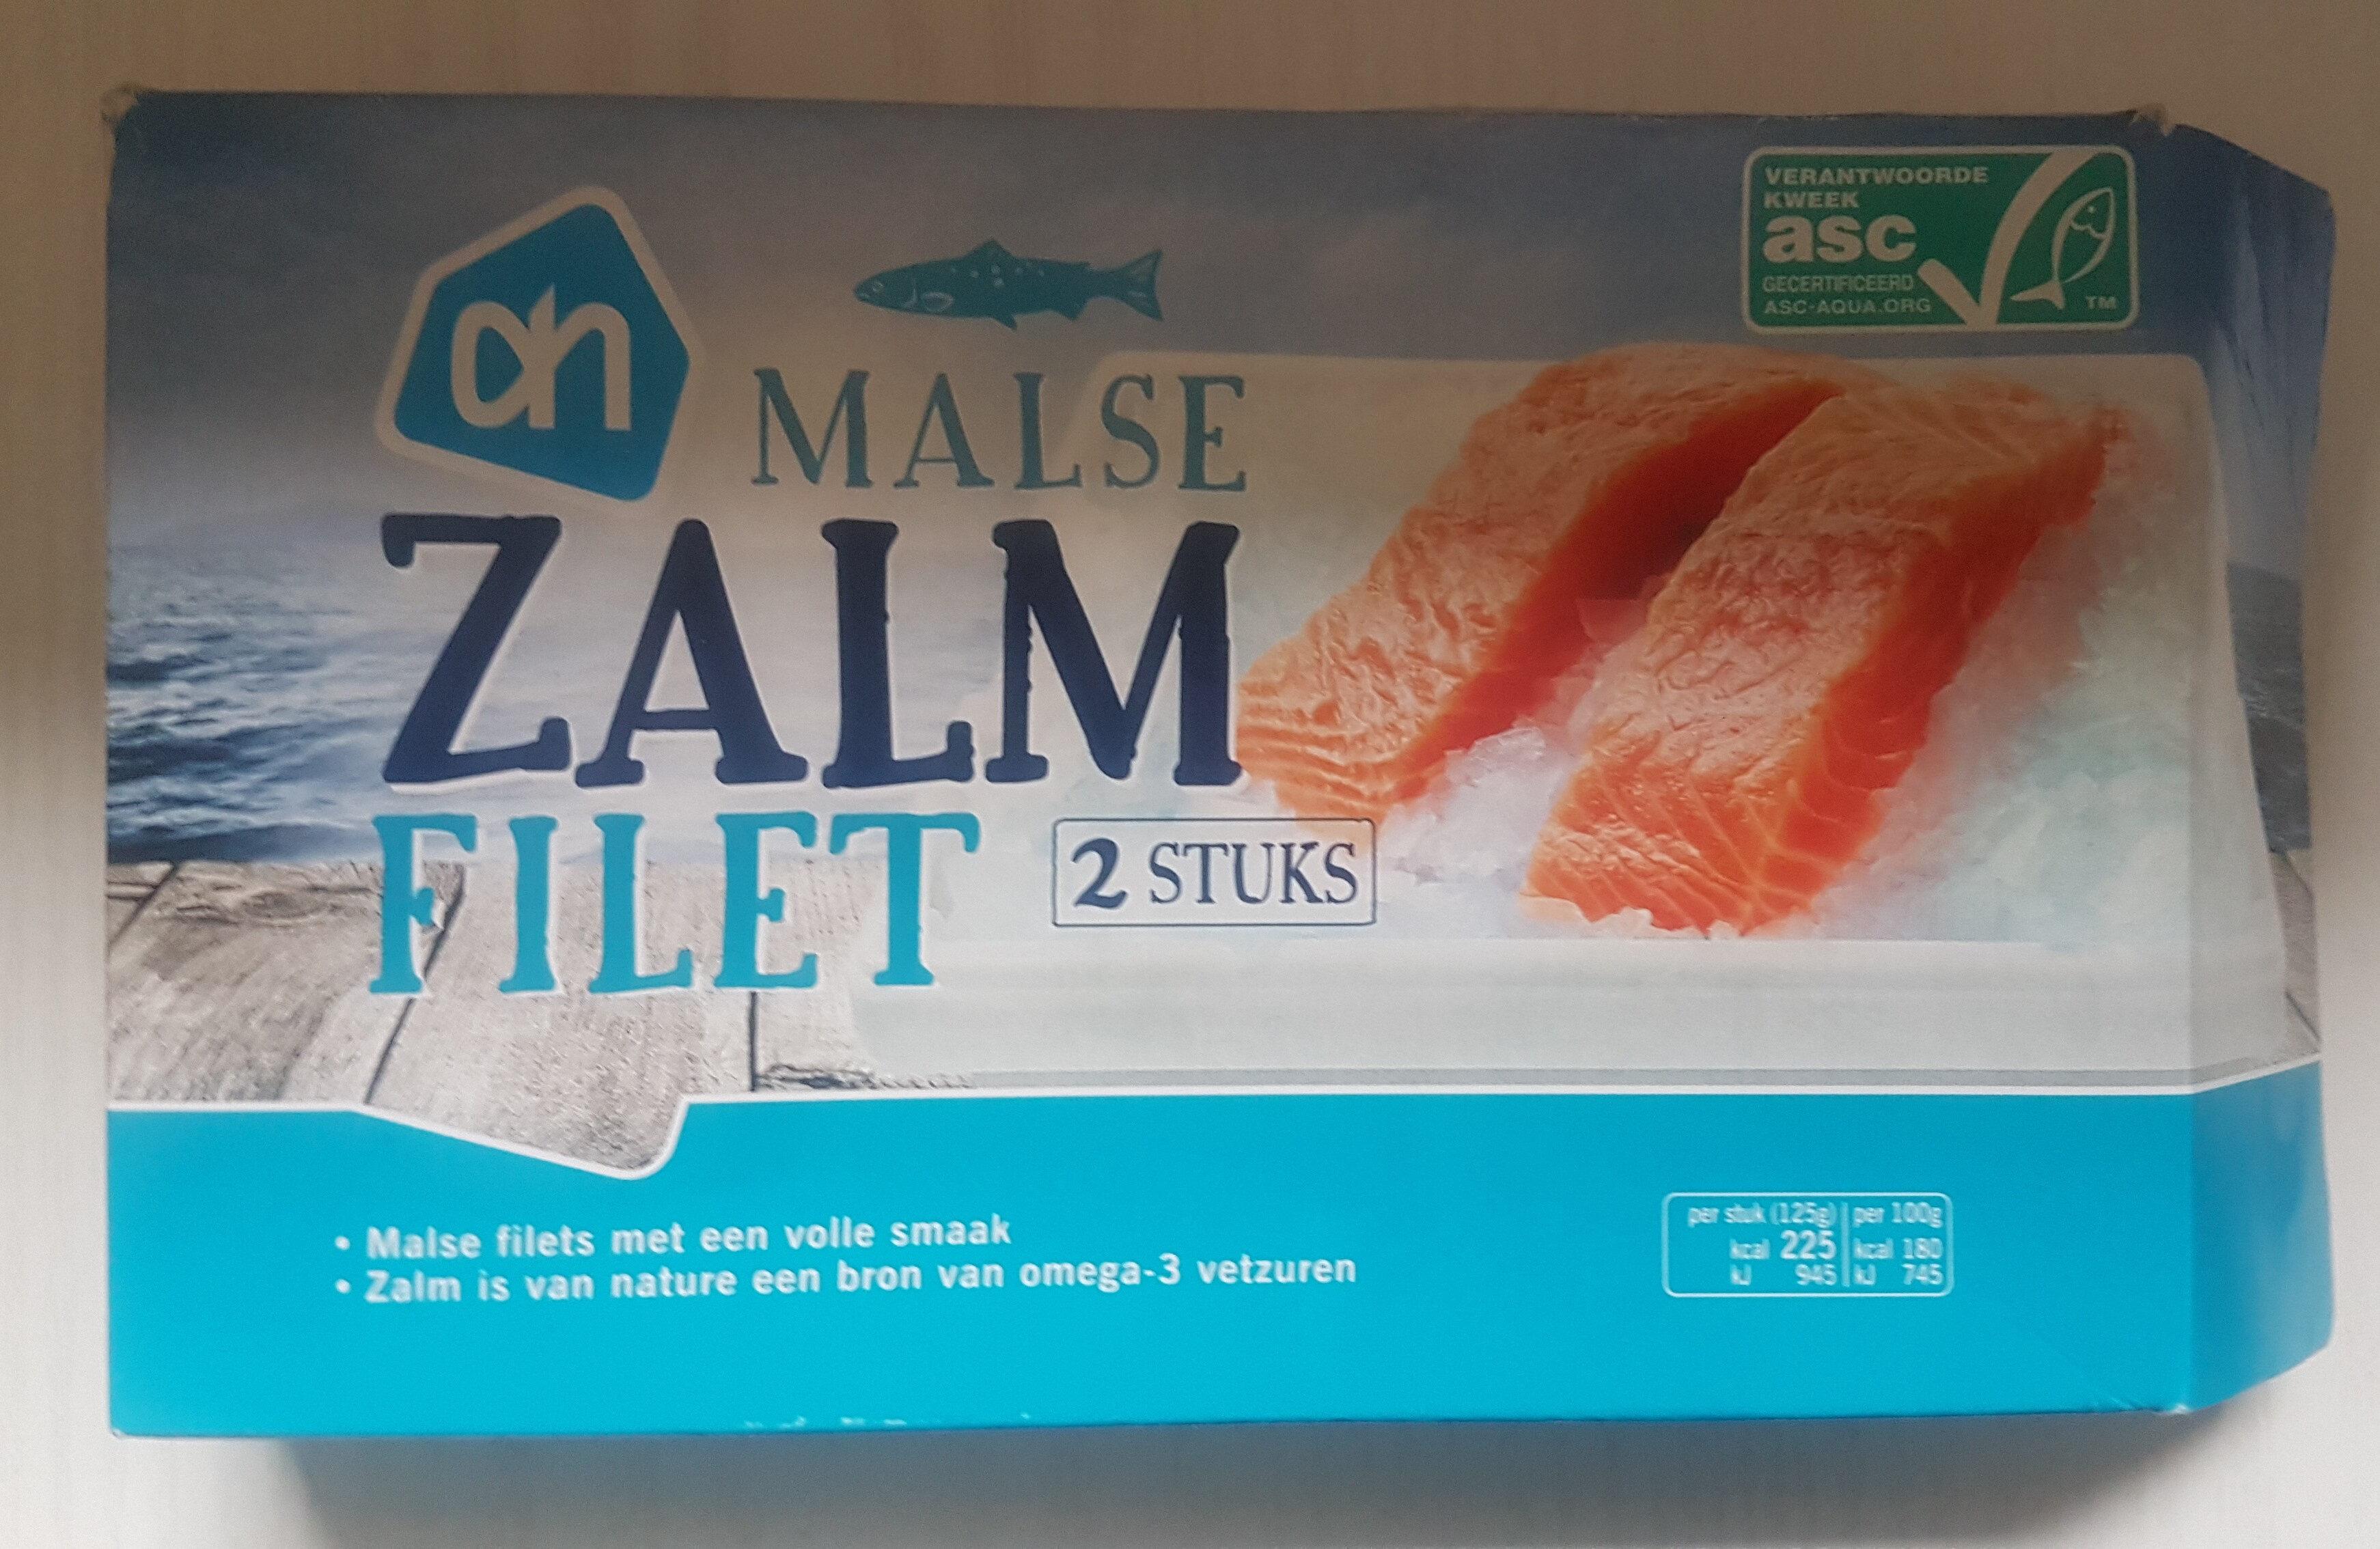 Malse Zalm Filet - Product - nl